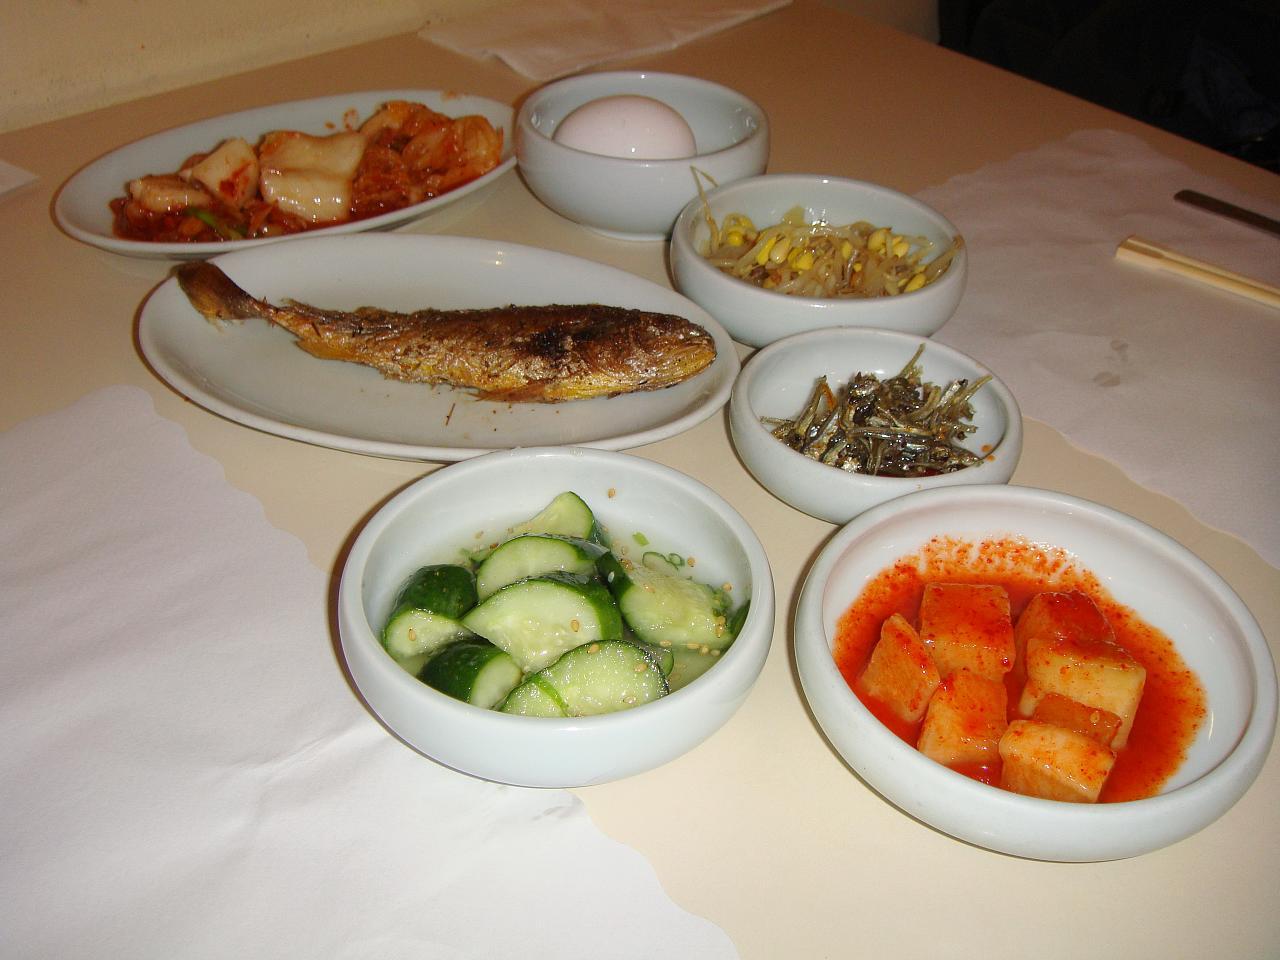 Kimchi assortment or banchan